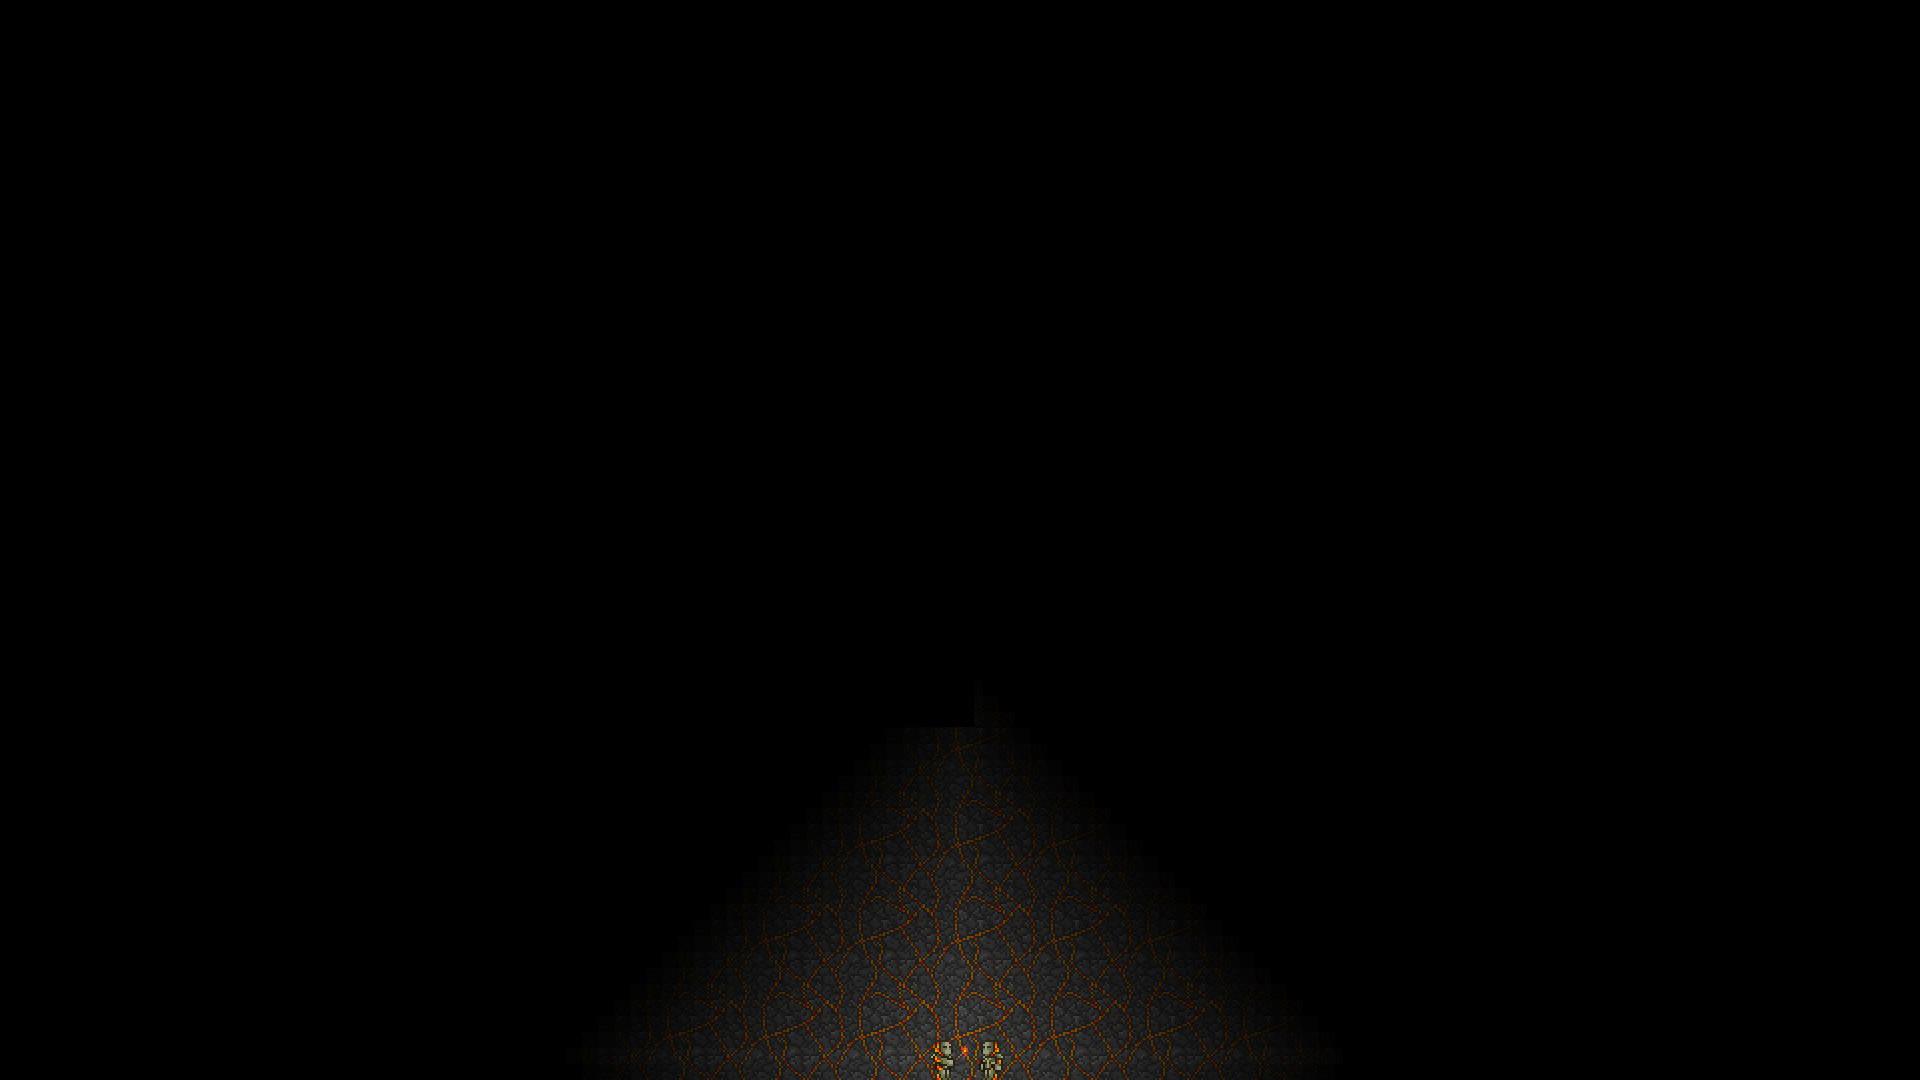 Dark Minimalist Terraria Wallpaper | Terraria Tips